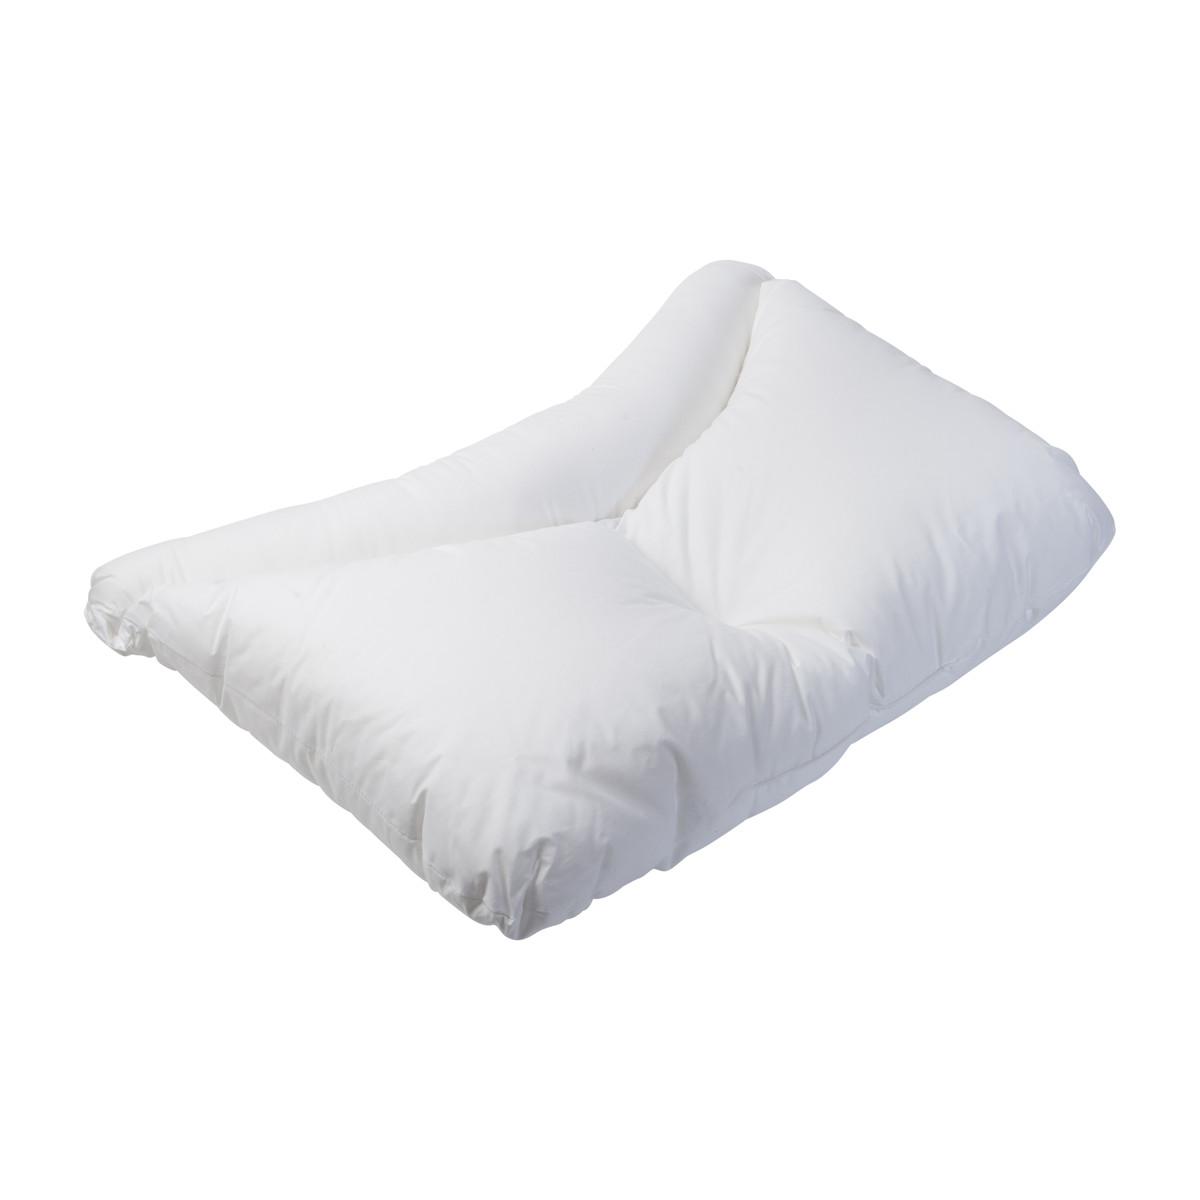 Healthsmart Side Sleeper Pillow Indemedical Com